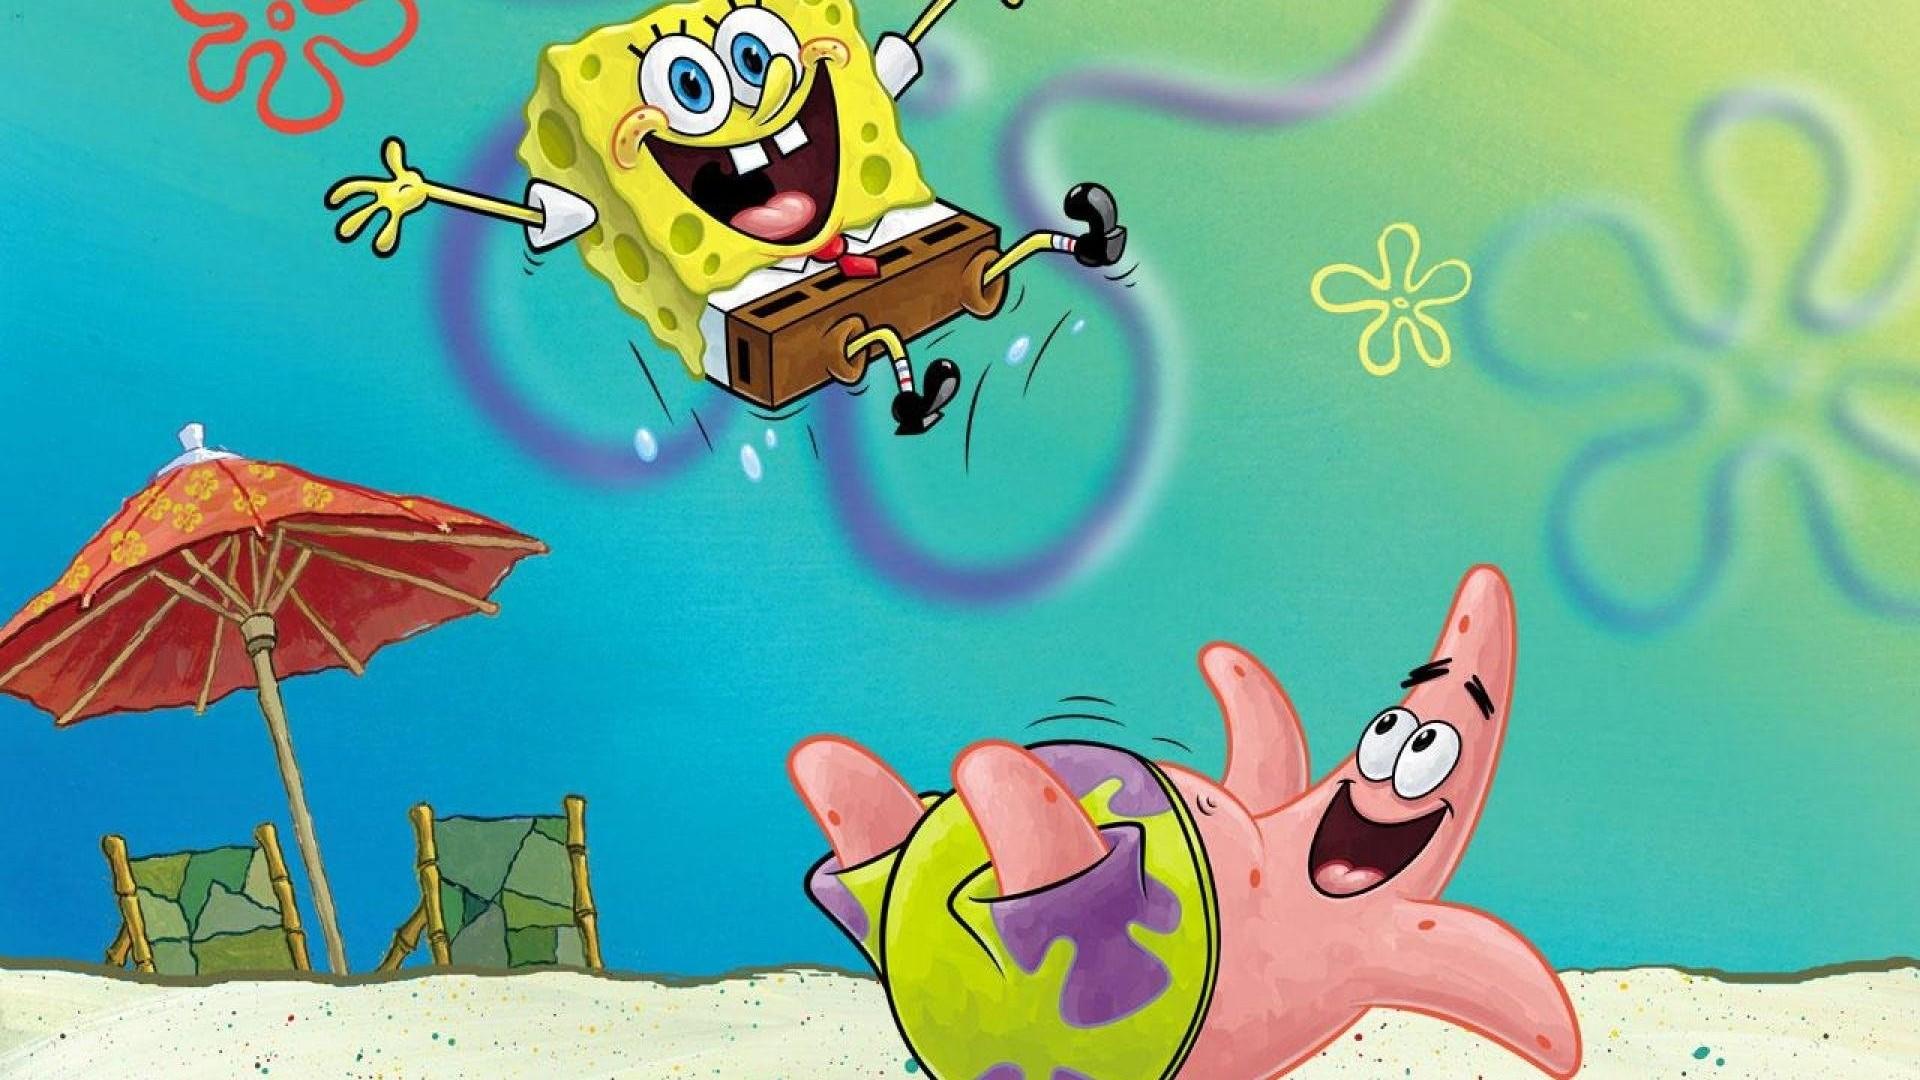 Spongebob And Patrick Wallpaper Free Download